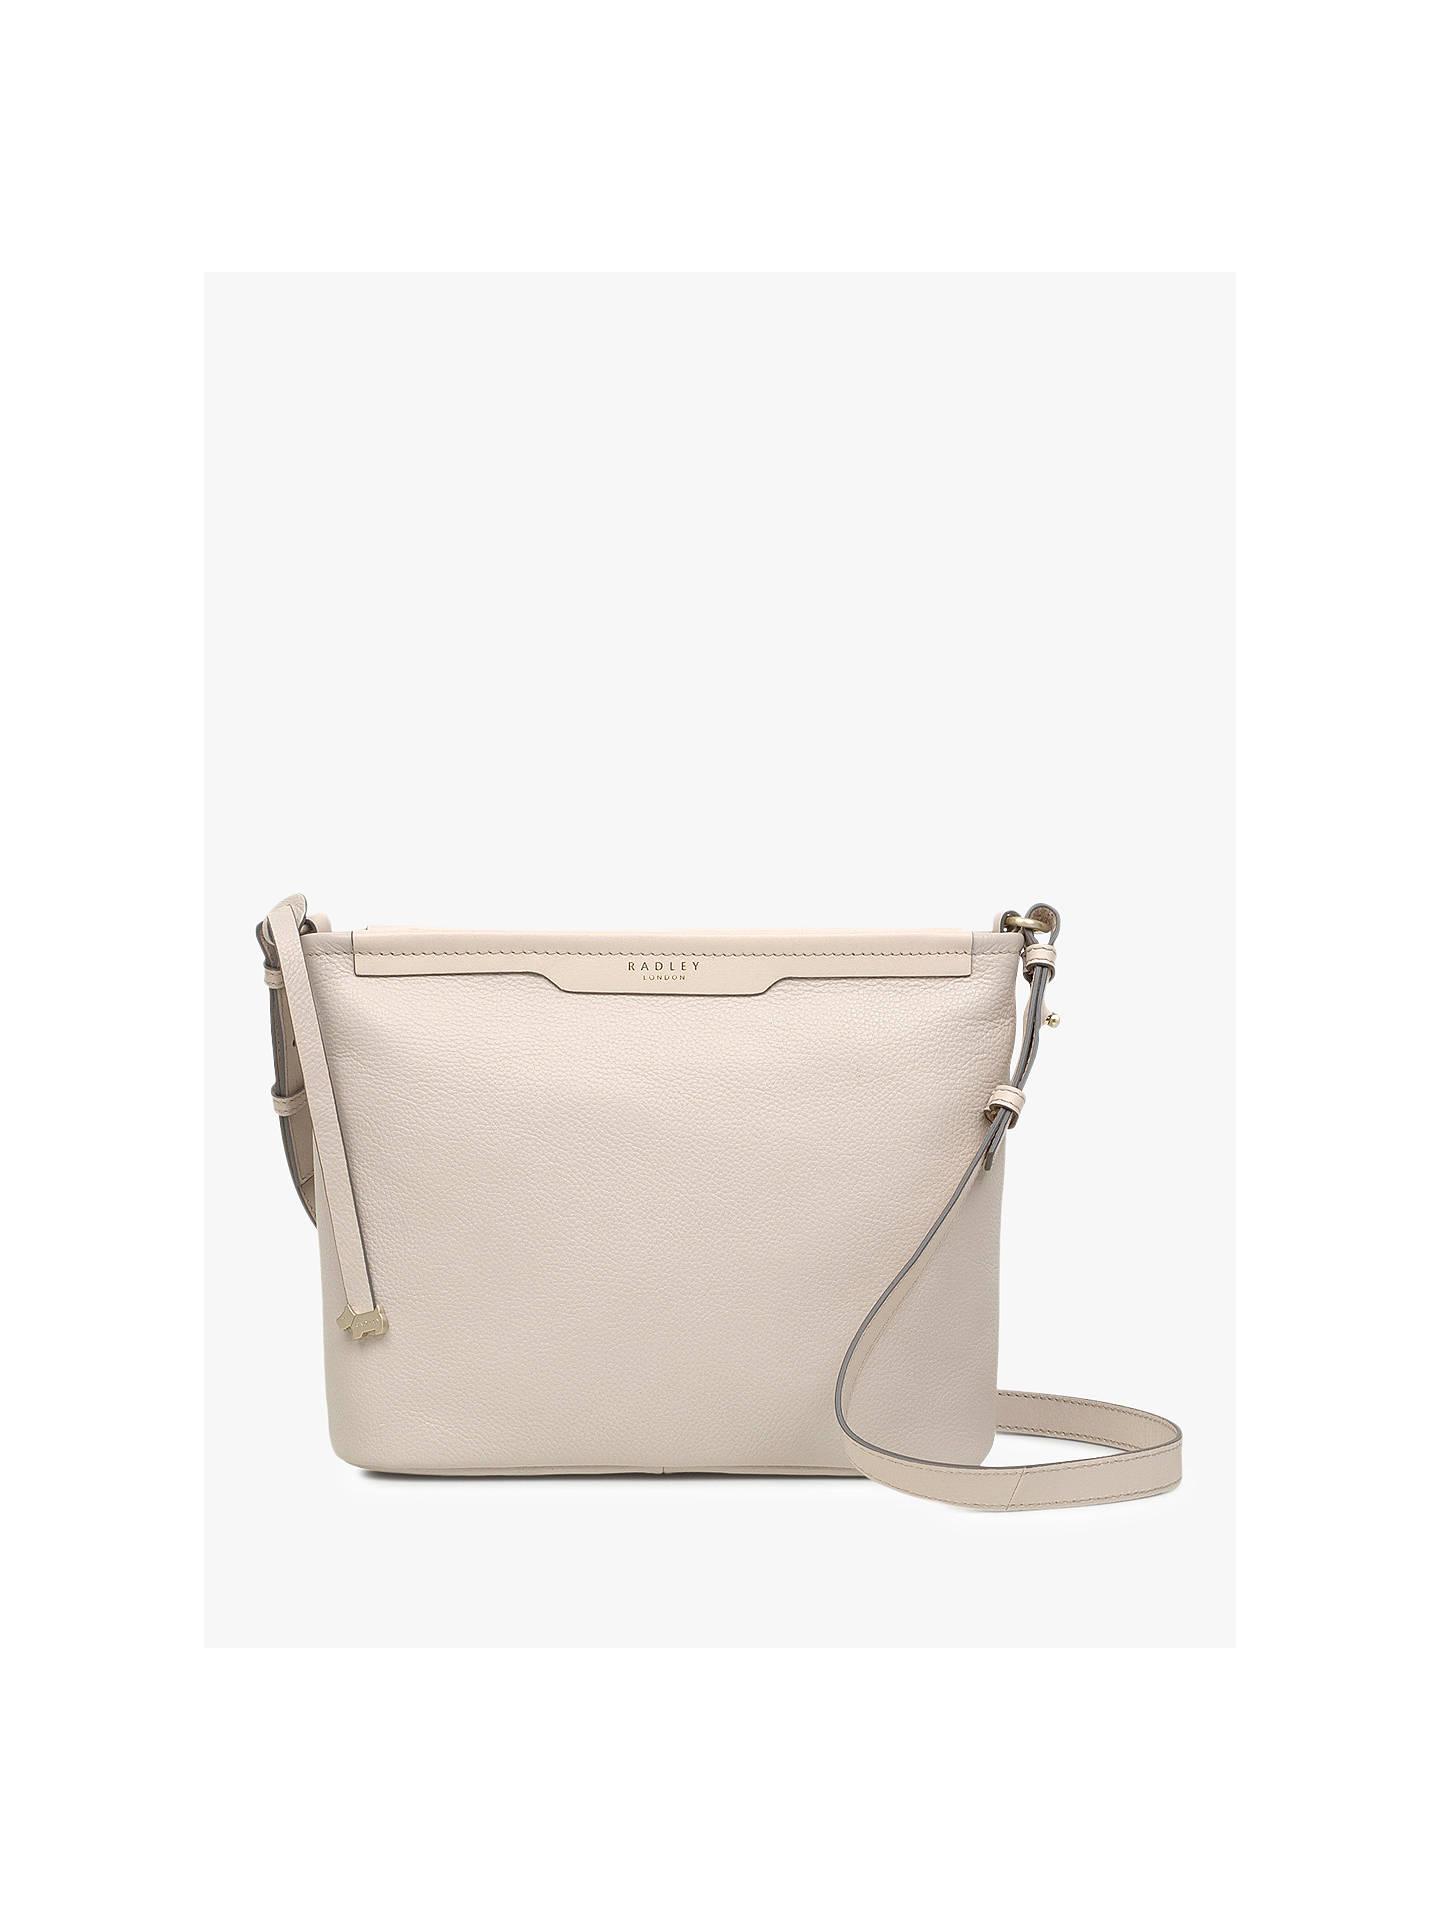 42ed1d46ebcda2 Buy Radley Patcham Place Medium Zip-Top Leather Cross Body Bag, Grey Online  at ...